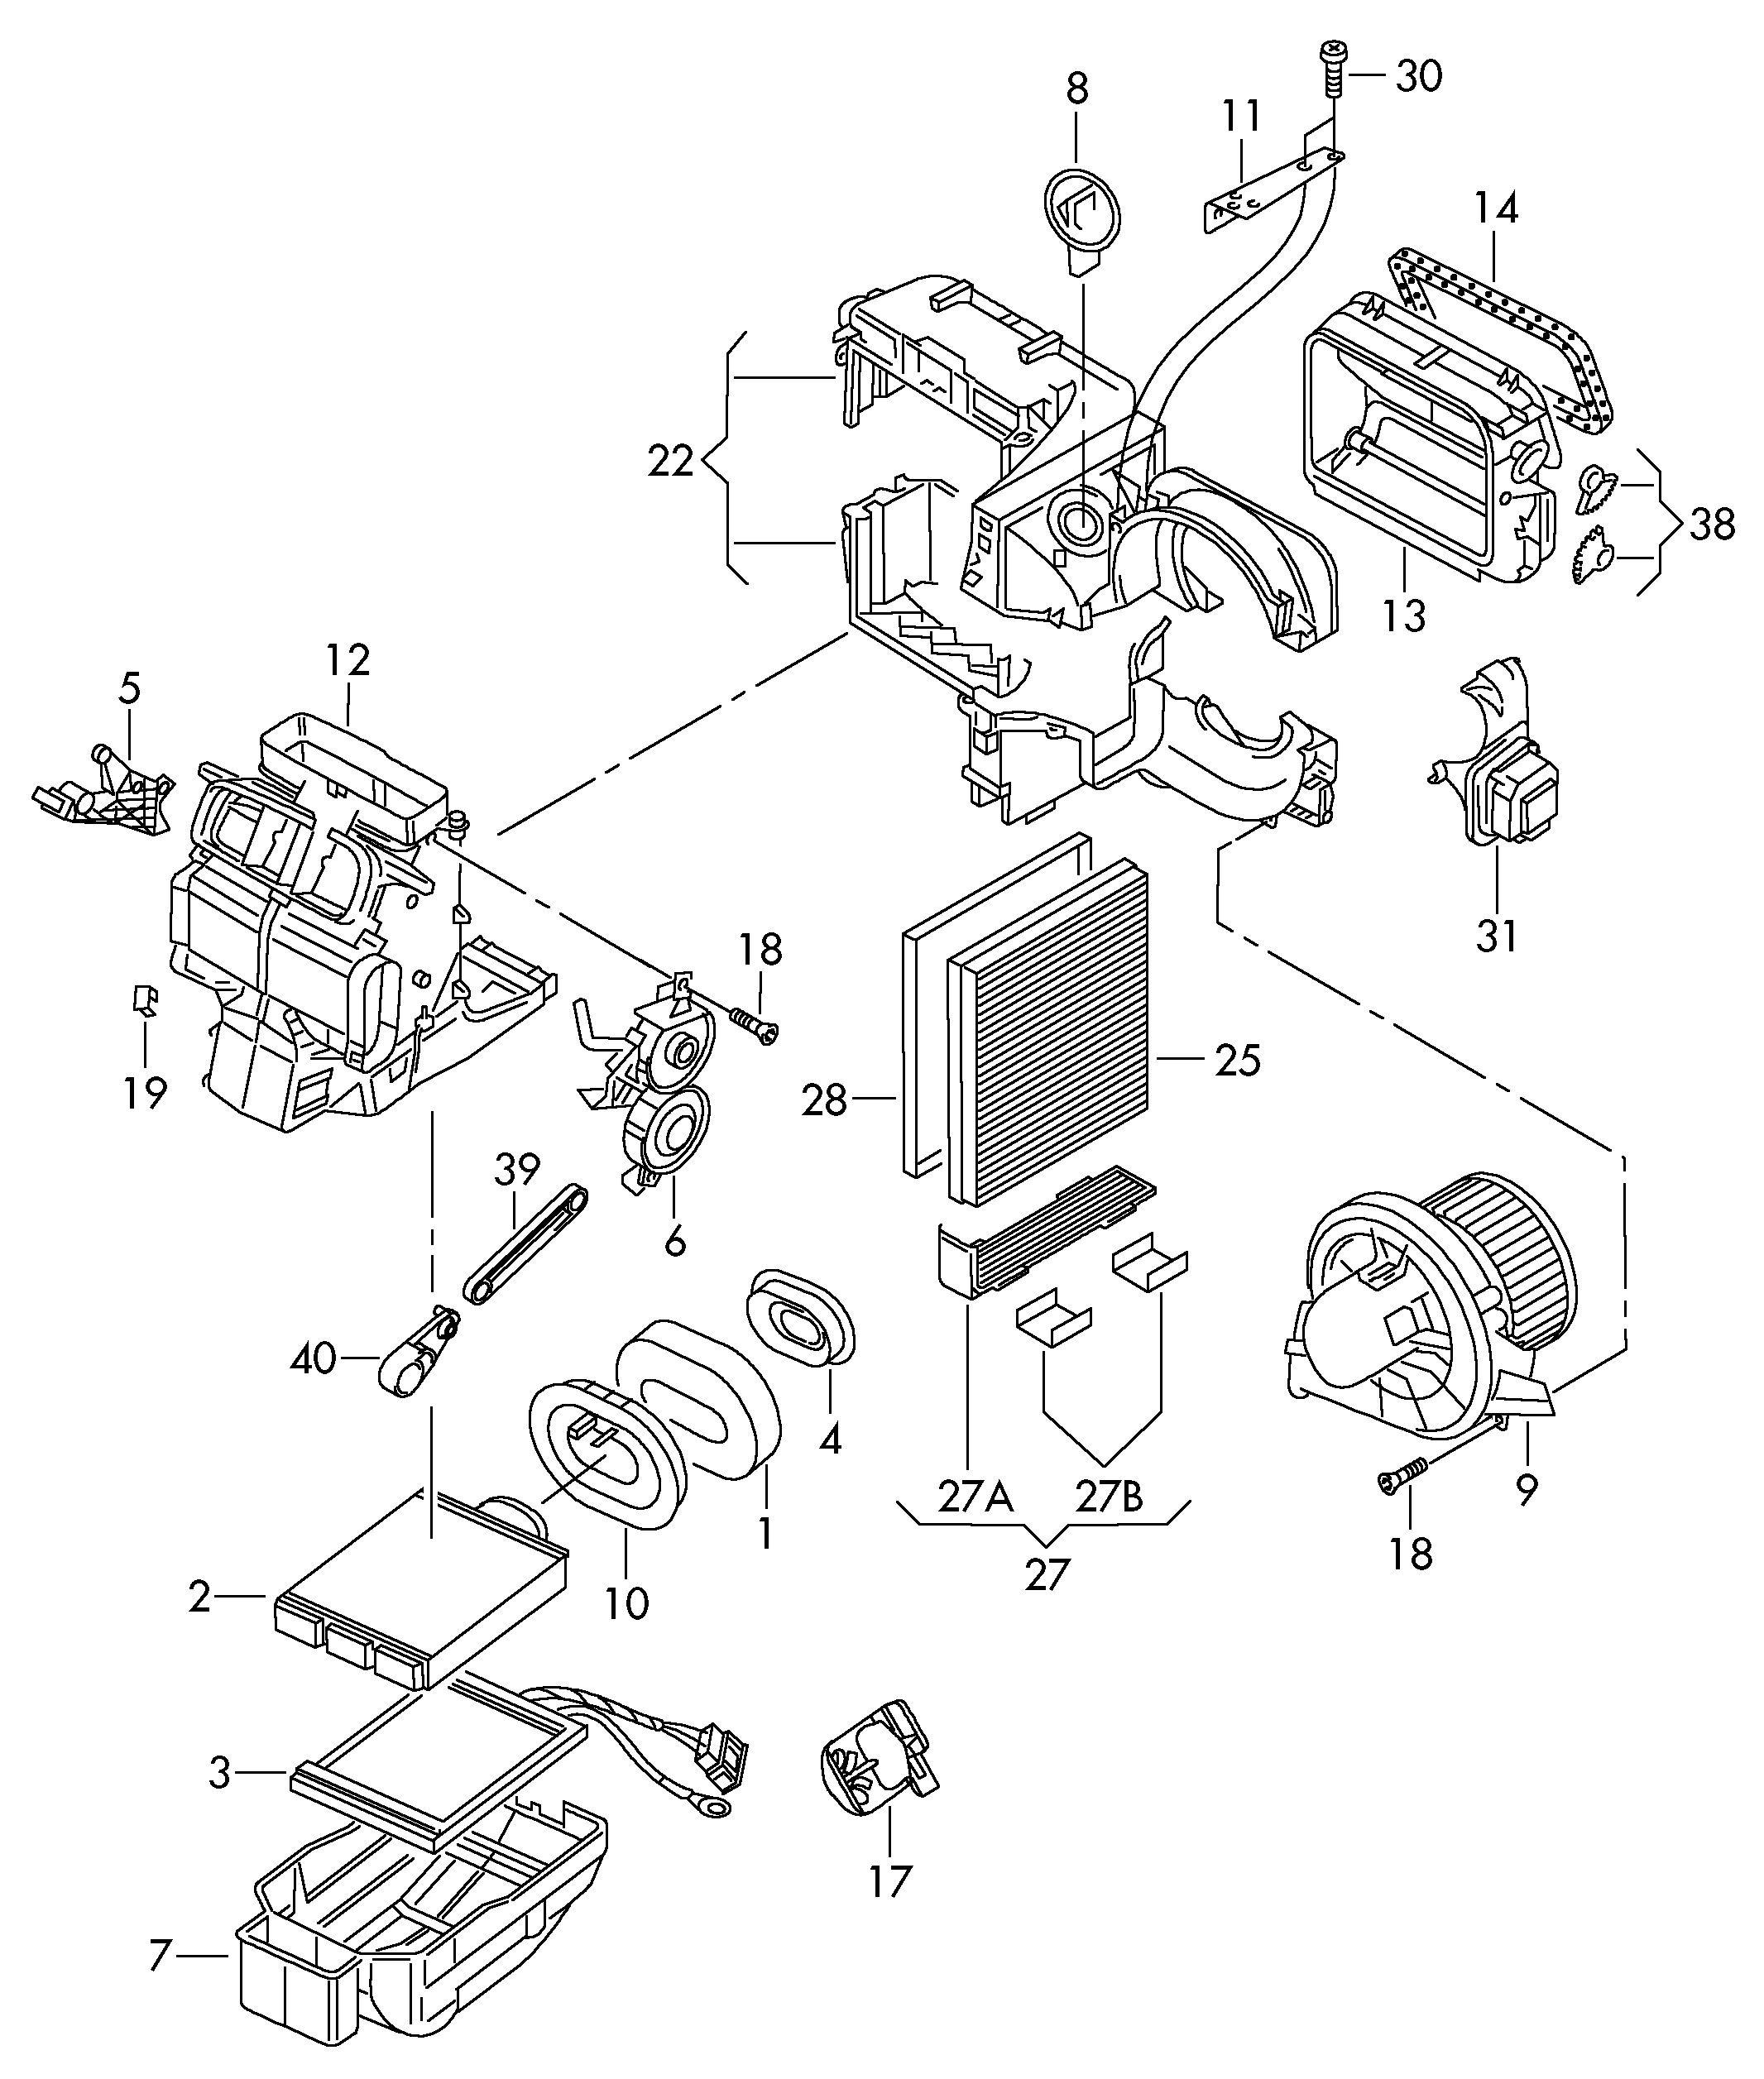 New Vw Golf Mk5 Rear Light Wiring Diagram | Diagram, Vw golf, GolfPinterest